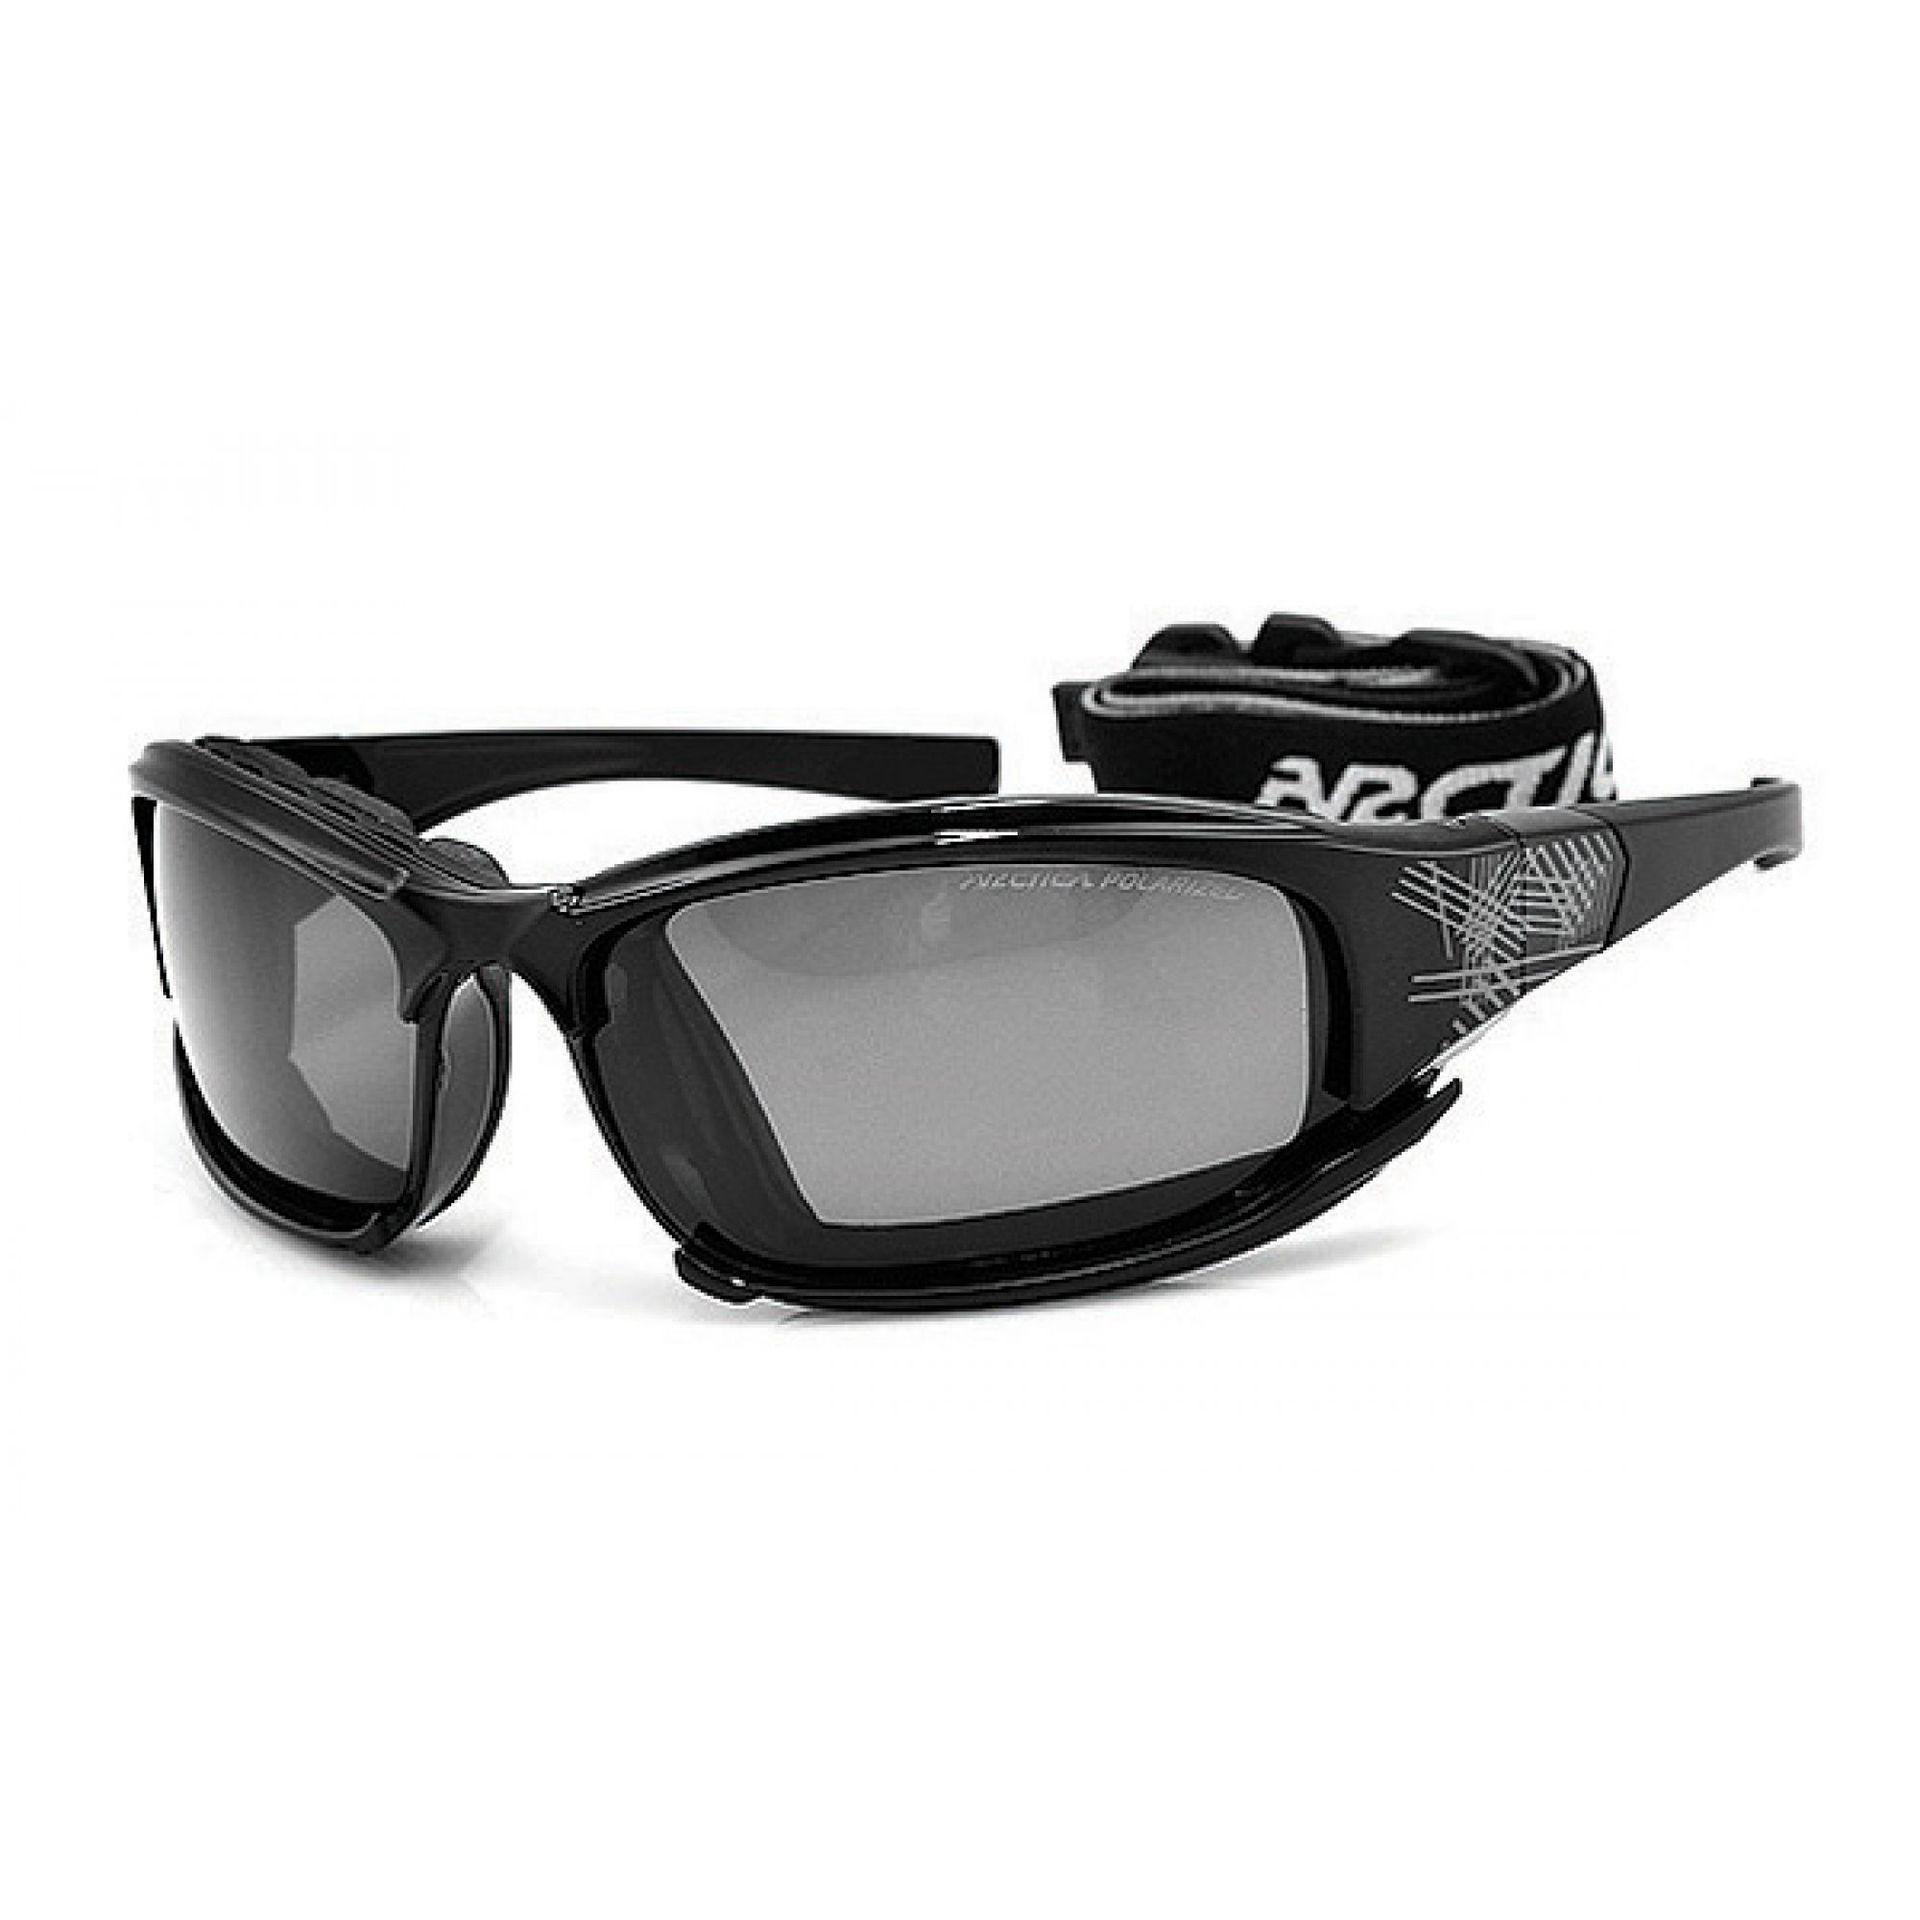 Okulary Arctica S-164 czarne